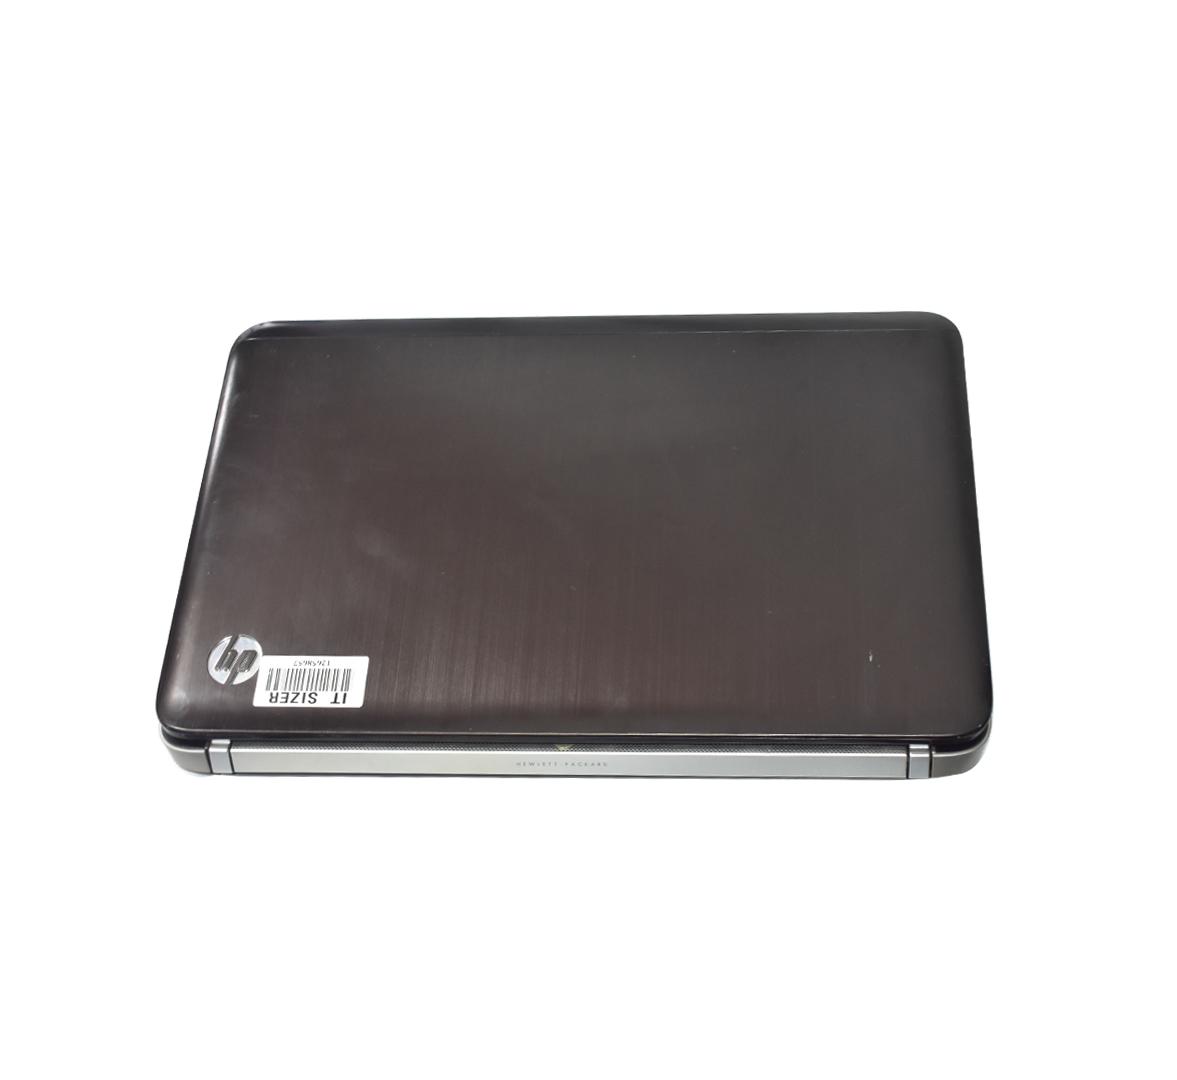 HP pavilion dv6 Business Laptop, INTEL(R)CORE(TM) I3-2310M CPU, 6GB DDR3 SODIMM RAM, 256 SSD 2.5 , 15 inch Display, Windows 10 Pro (Refurbished)